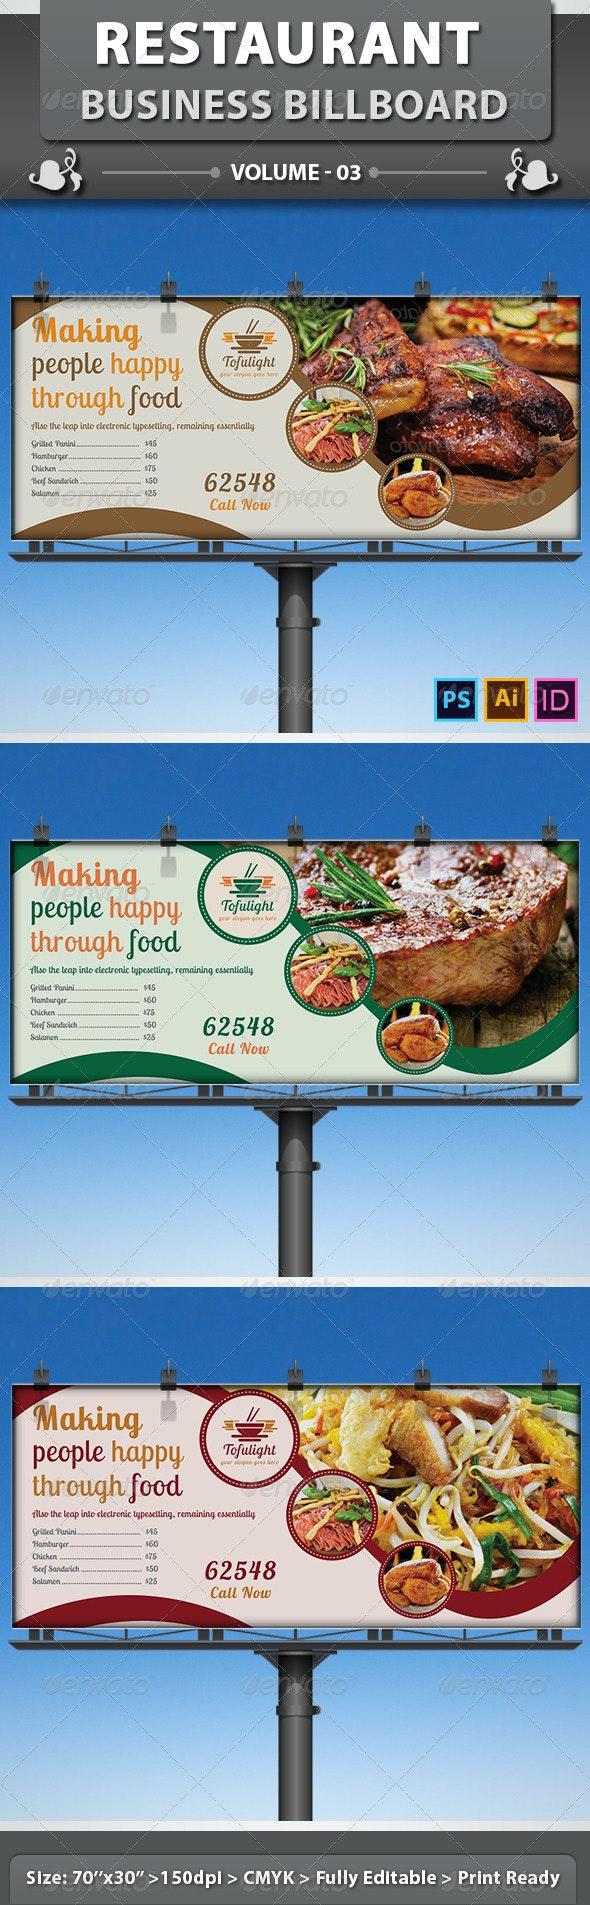 Restaurant Business Billboard   Volume 3 - Signage Print Templates